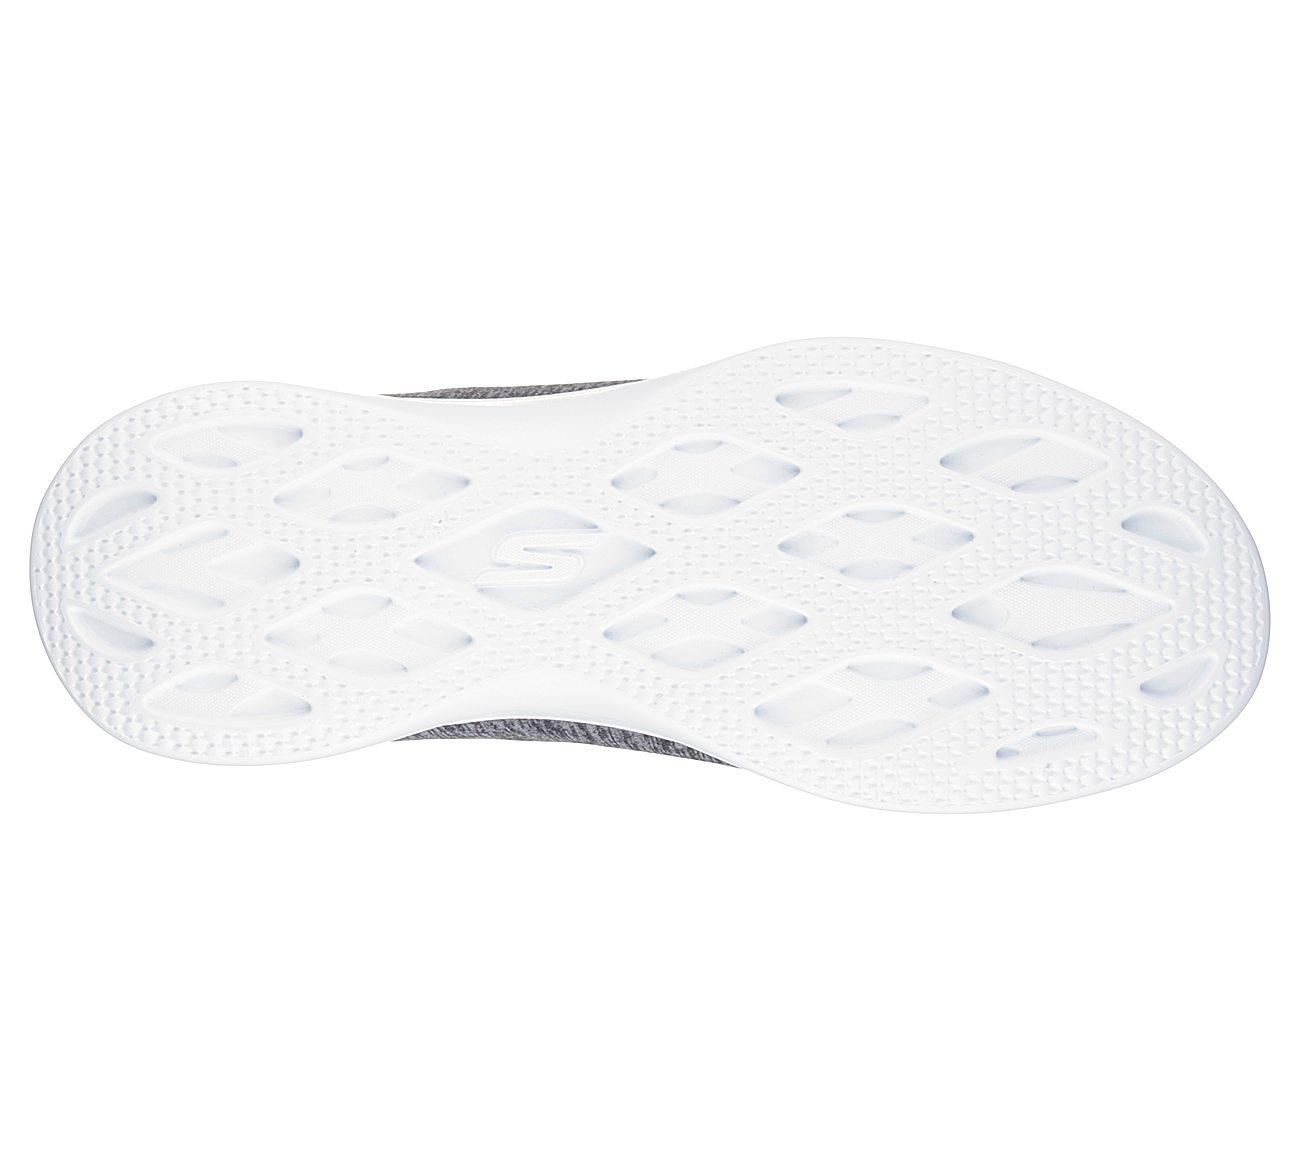 436cc9c4885 Buy SKECHERS Skechers GO STEP Lite - Beam Skechers Performance Shoes ...